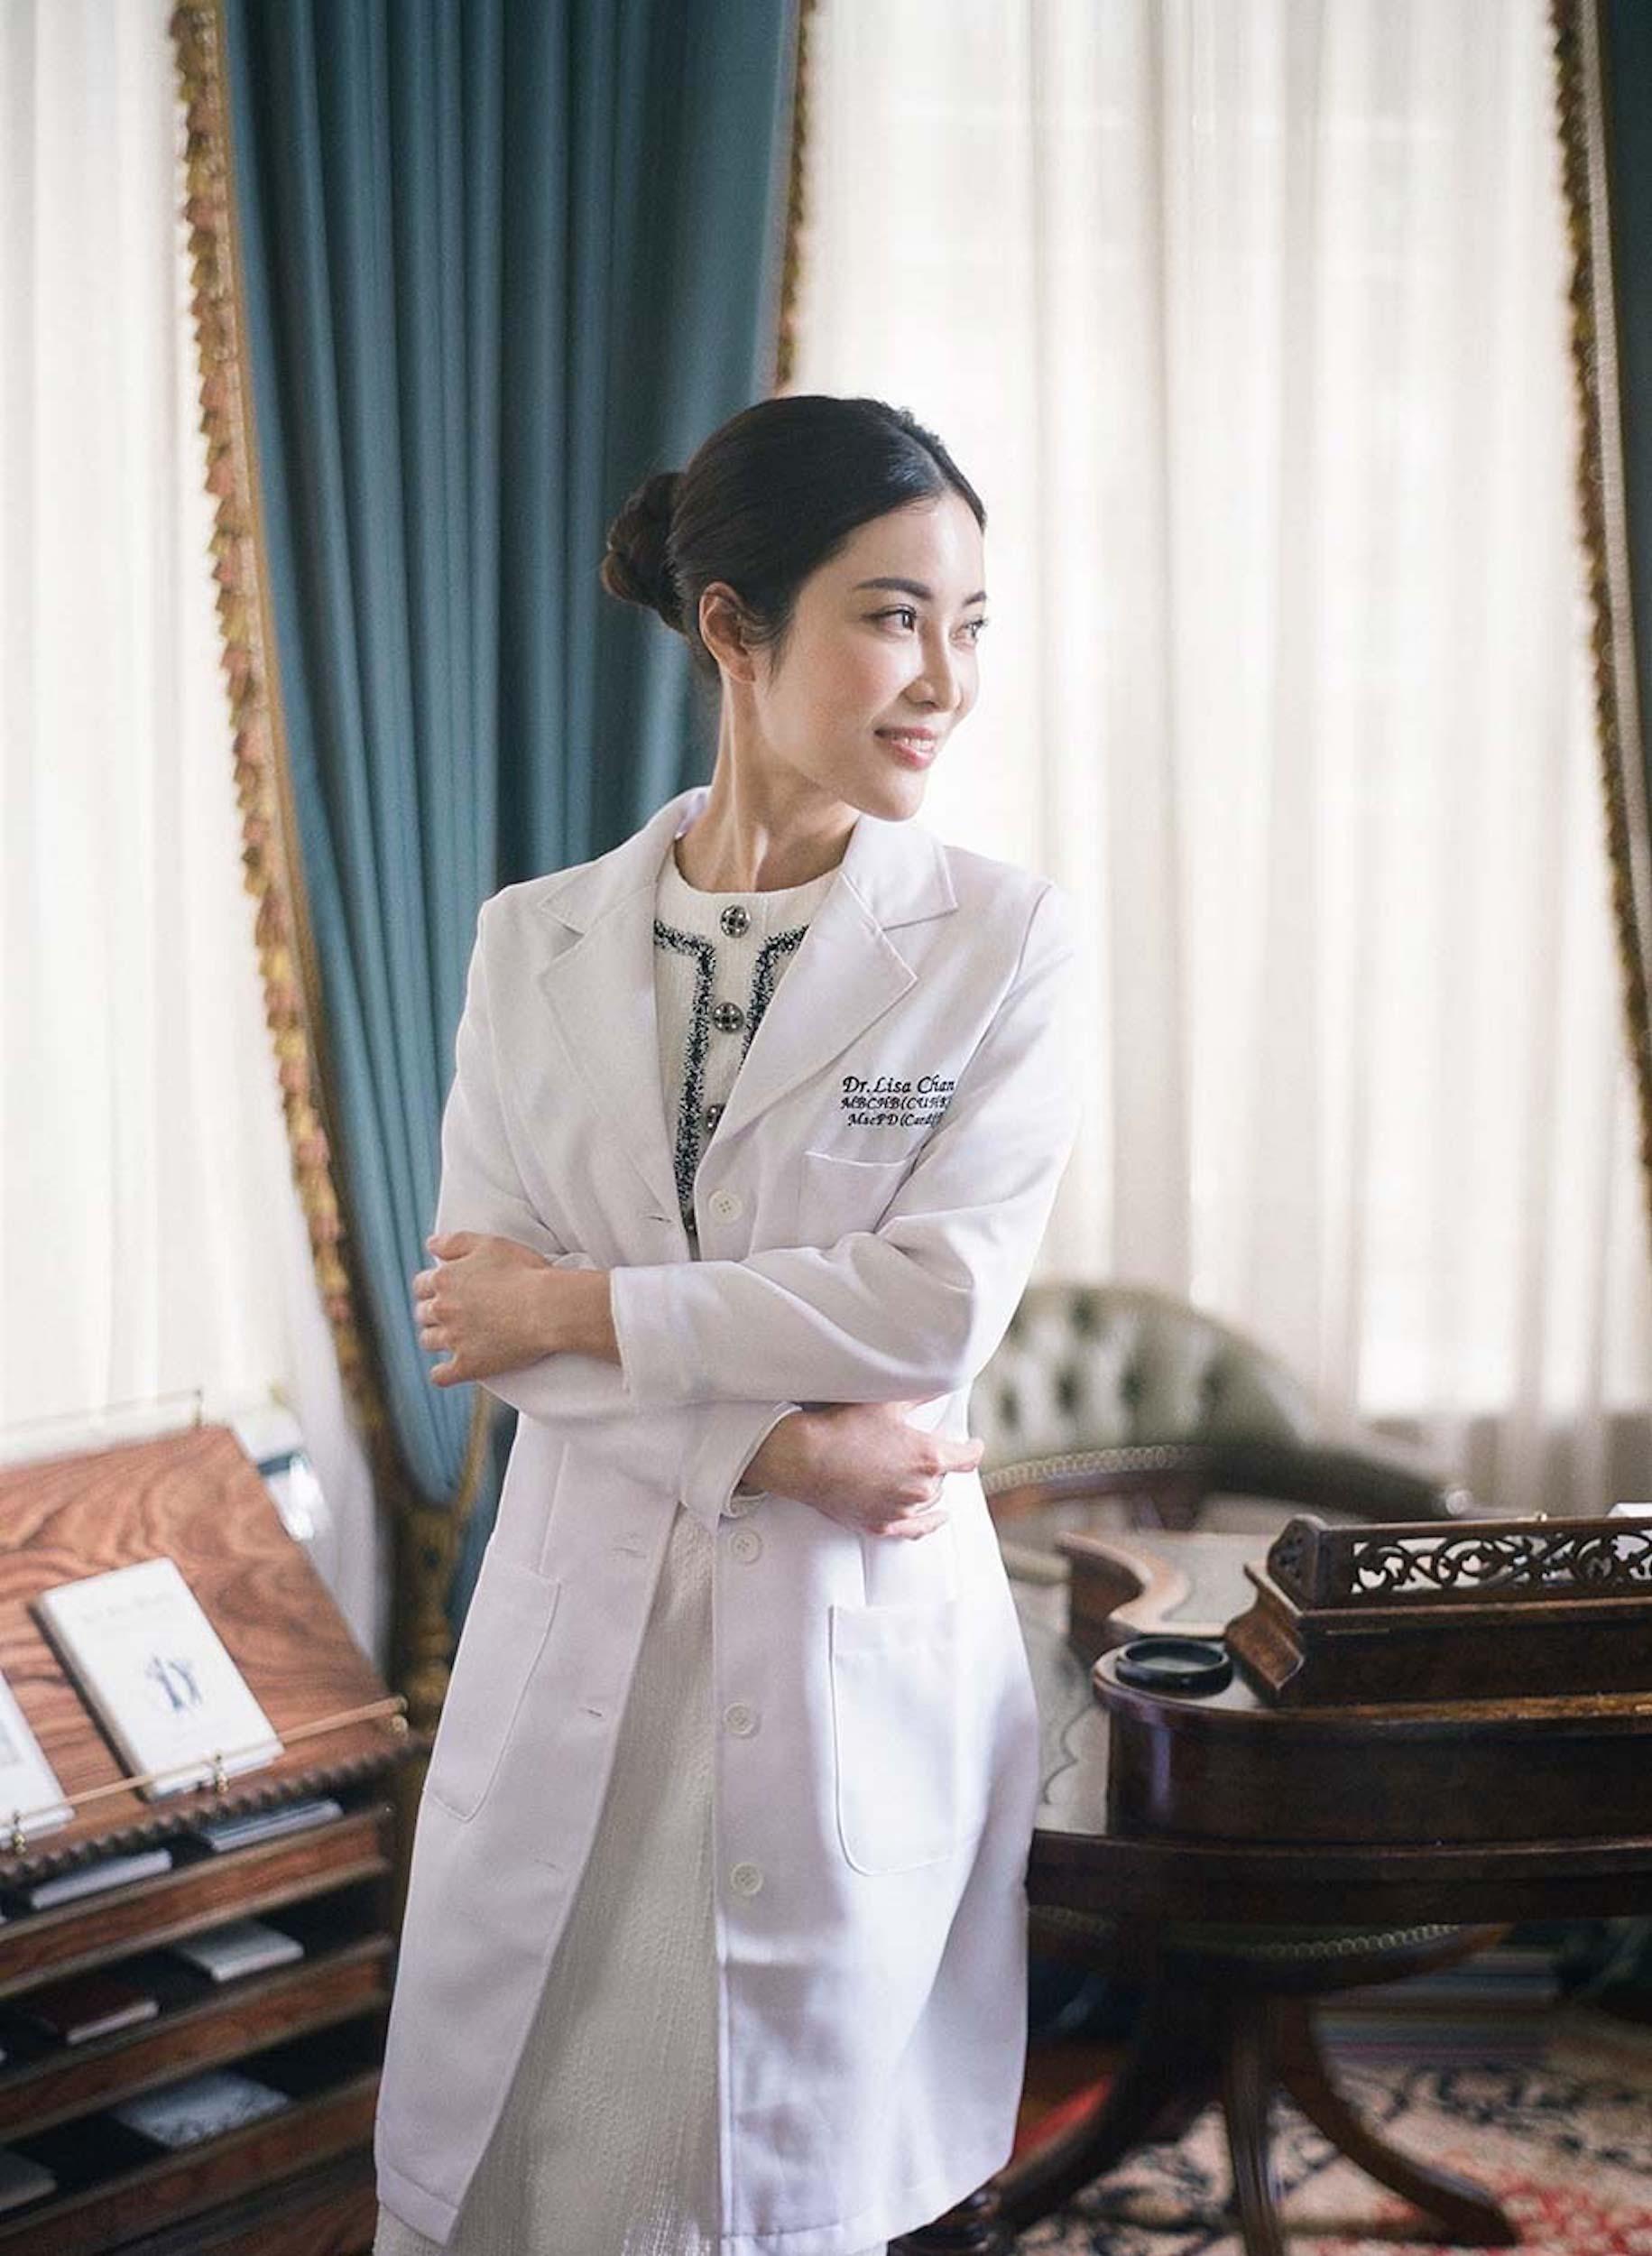 dr lisa chan portrait aesthetics doctor